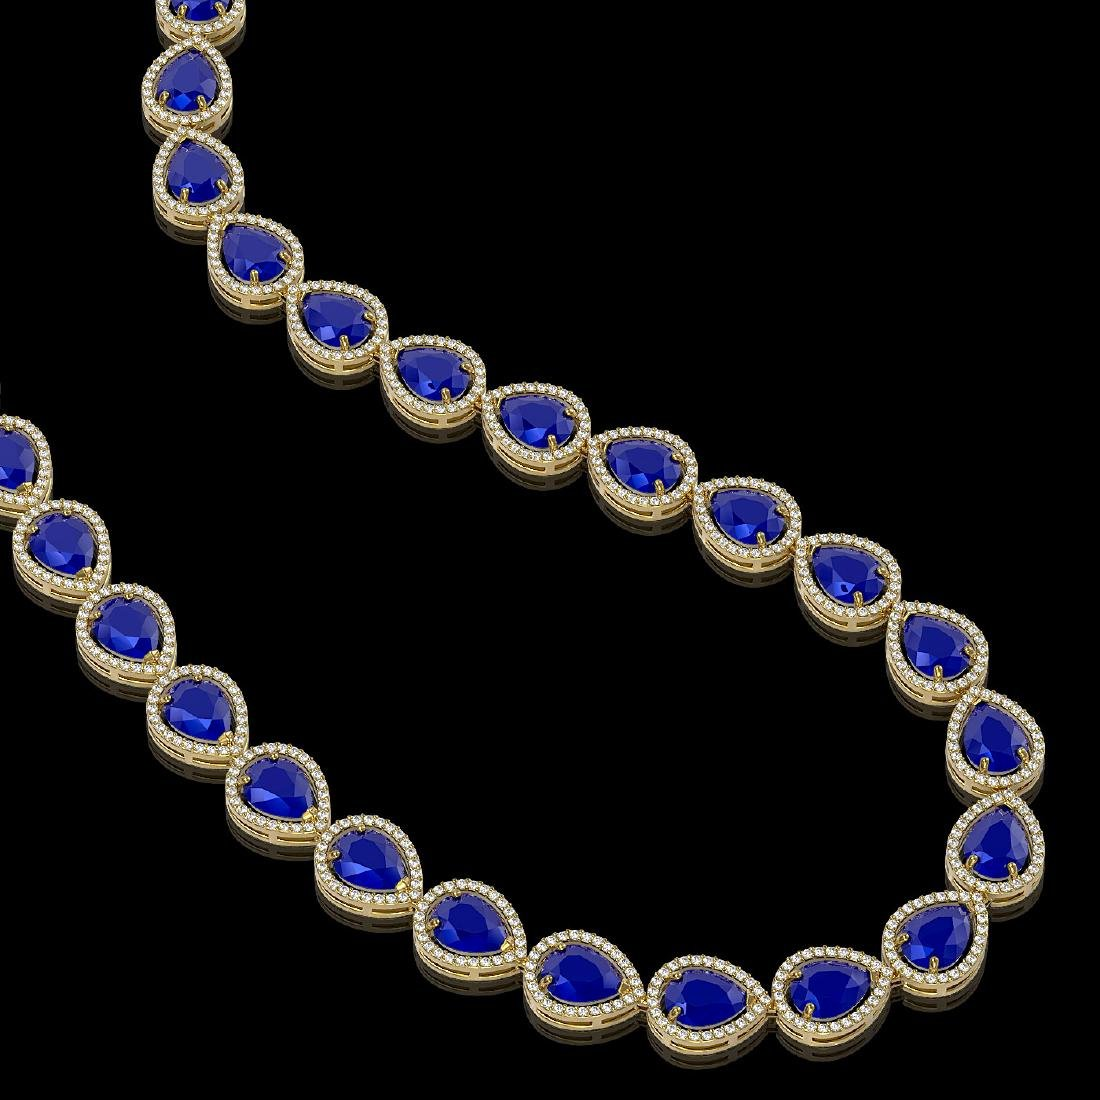 64.01 CTW Sapphire & Diamond Halo Necklace 10K Yellow - 2